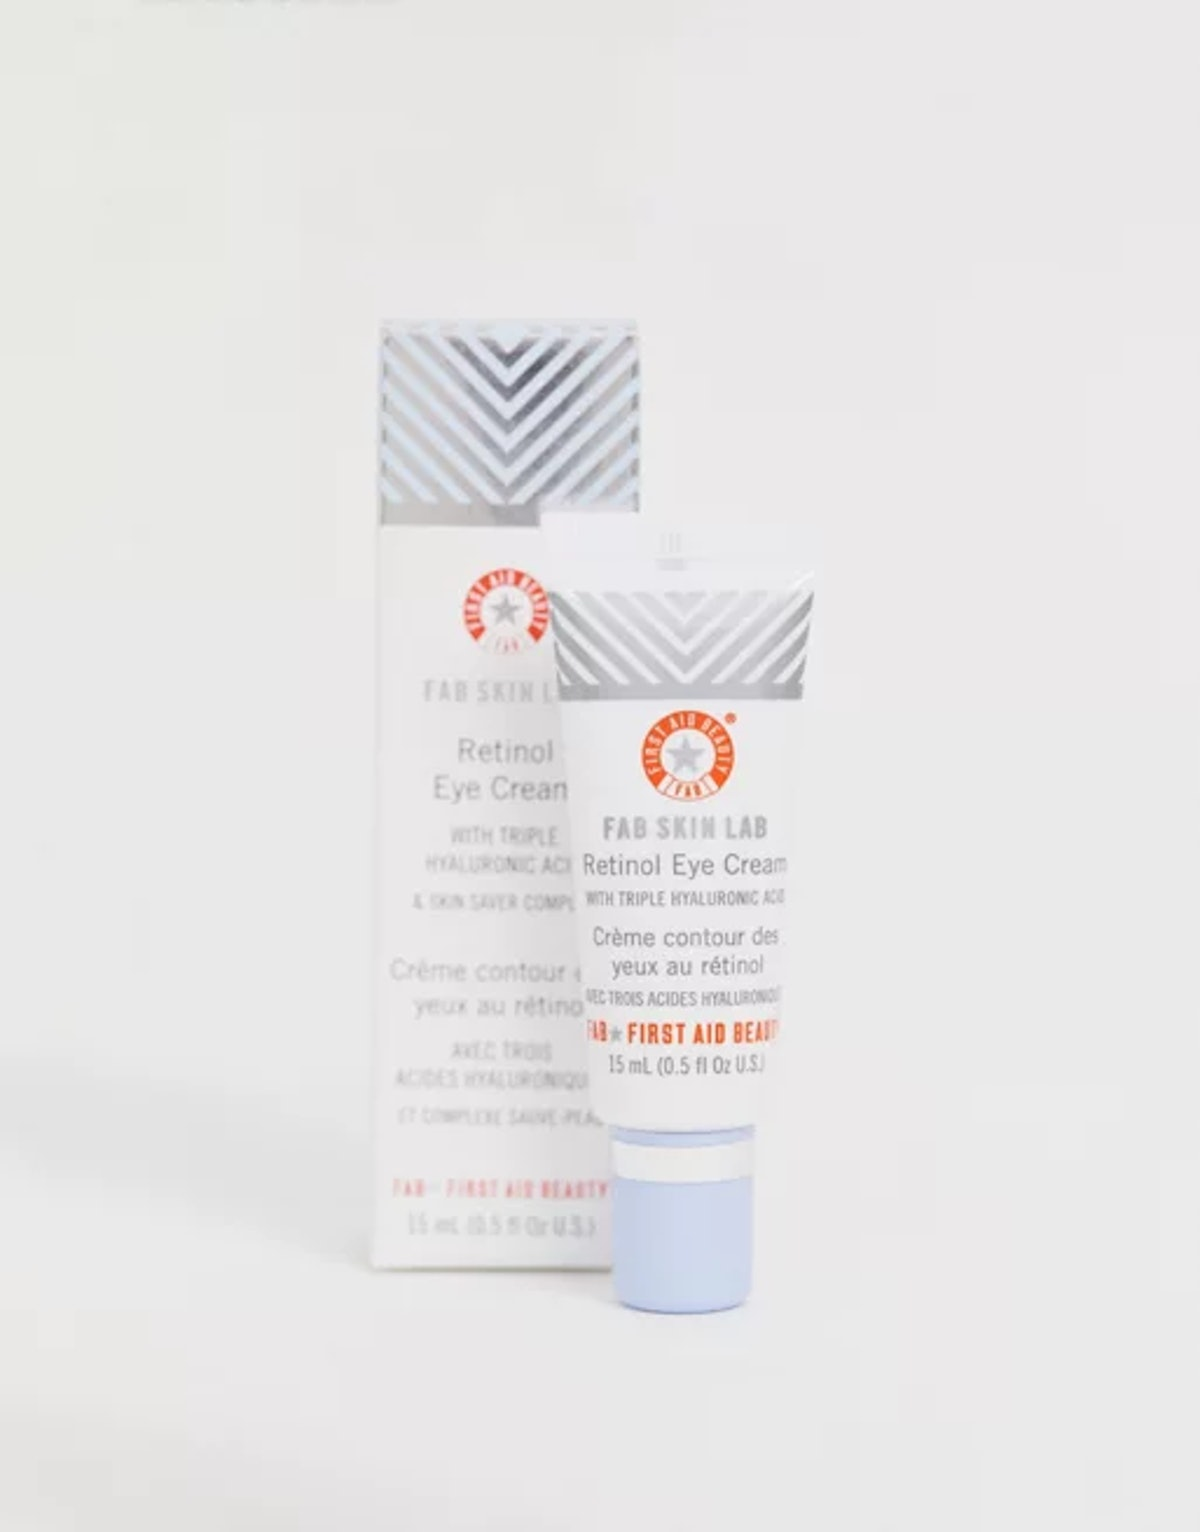 First Aid Beauty Skin Lab Retinol Eye Cream with Hyaluronic Acid